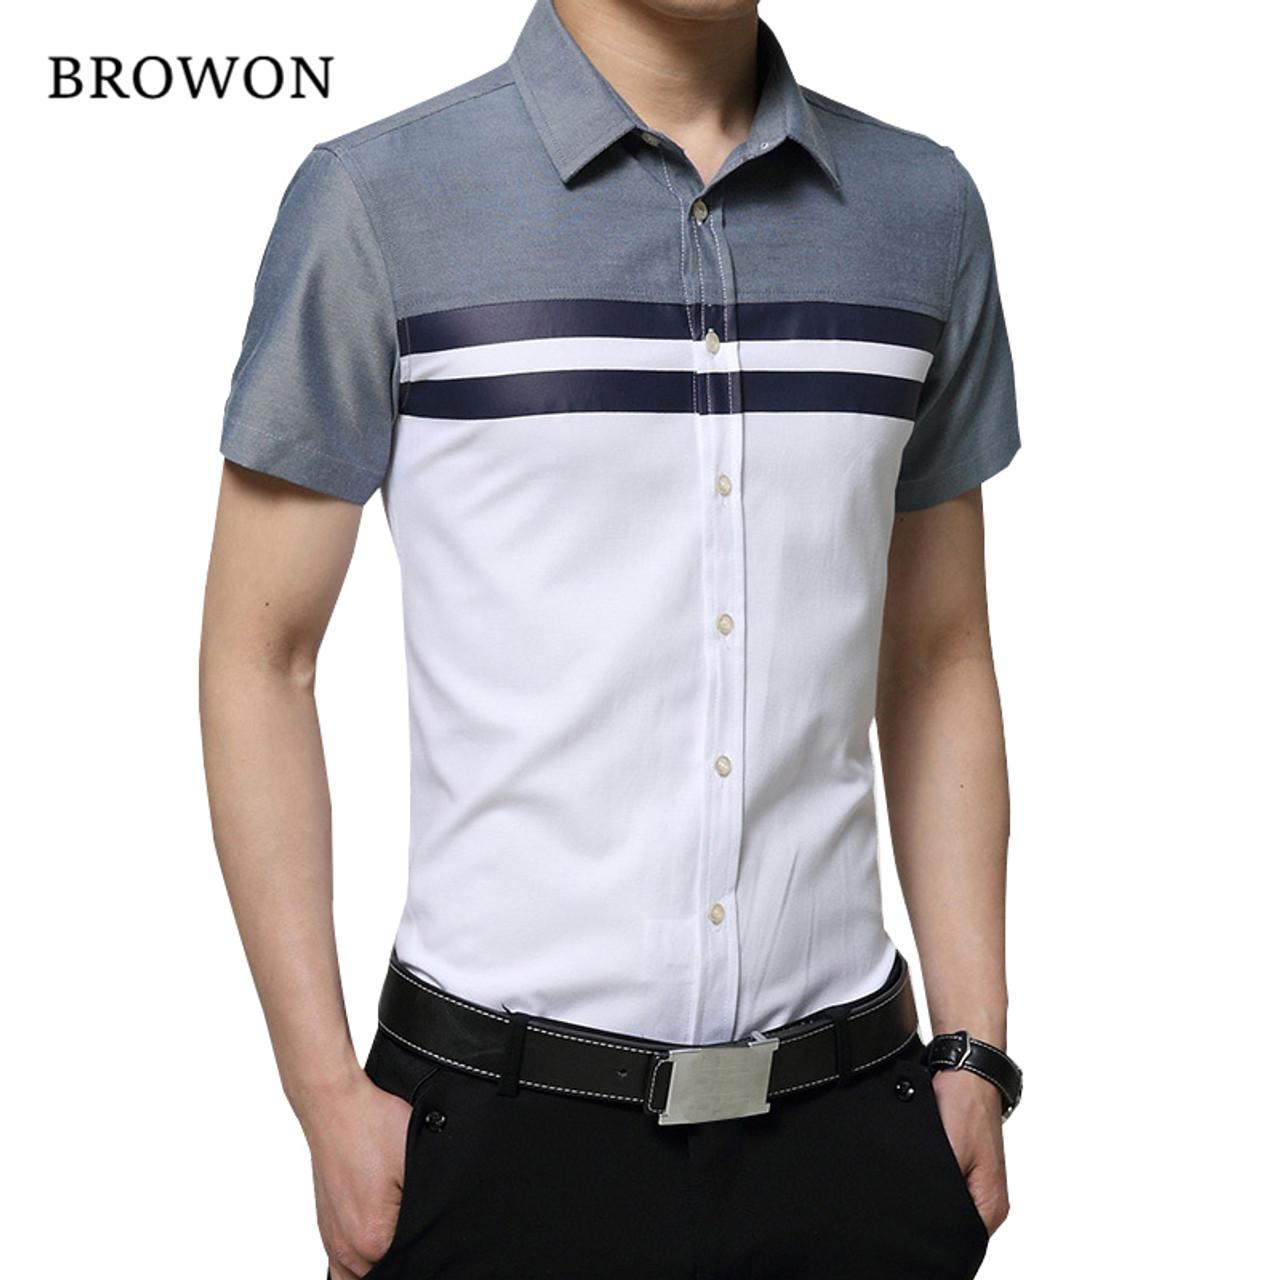 2aaf15ef BROWON New Arrival Mens Shirt Fashion Short Sleeve Men Shirt Regular Fit  Striped design Social Shirt Camisa Social Masculina - OnshopDeals.Com